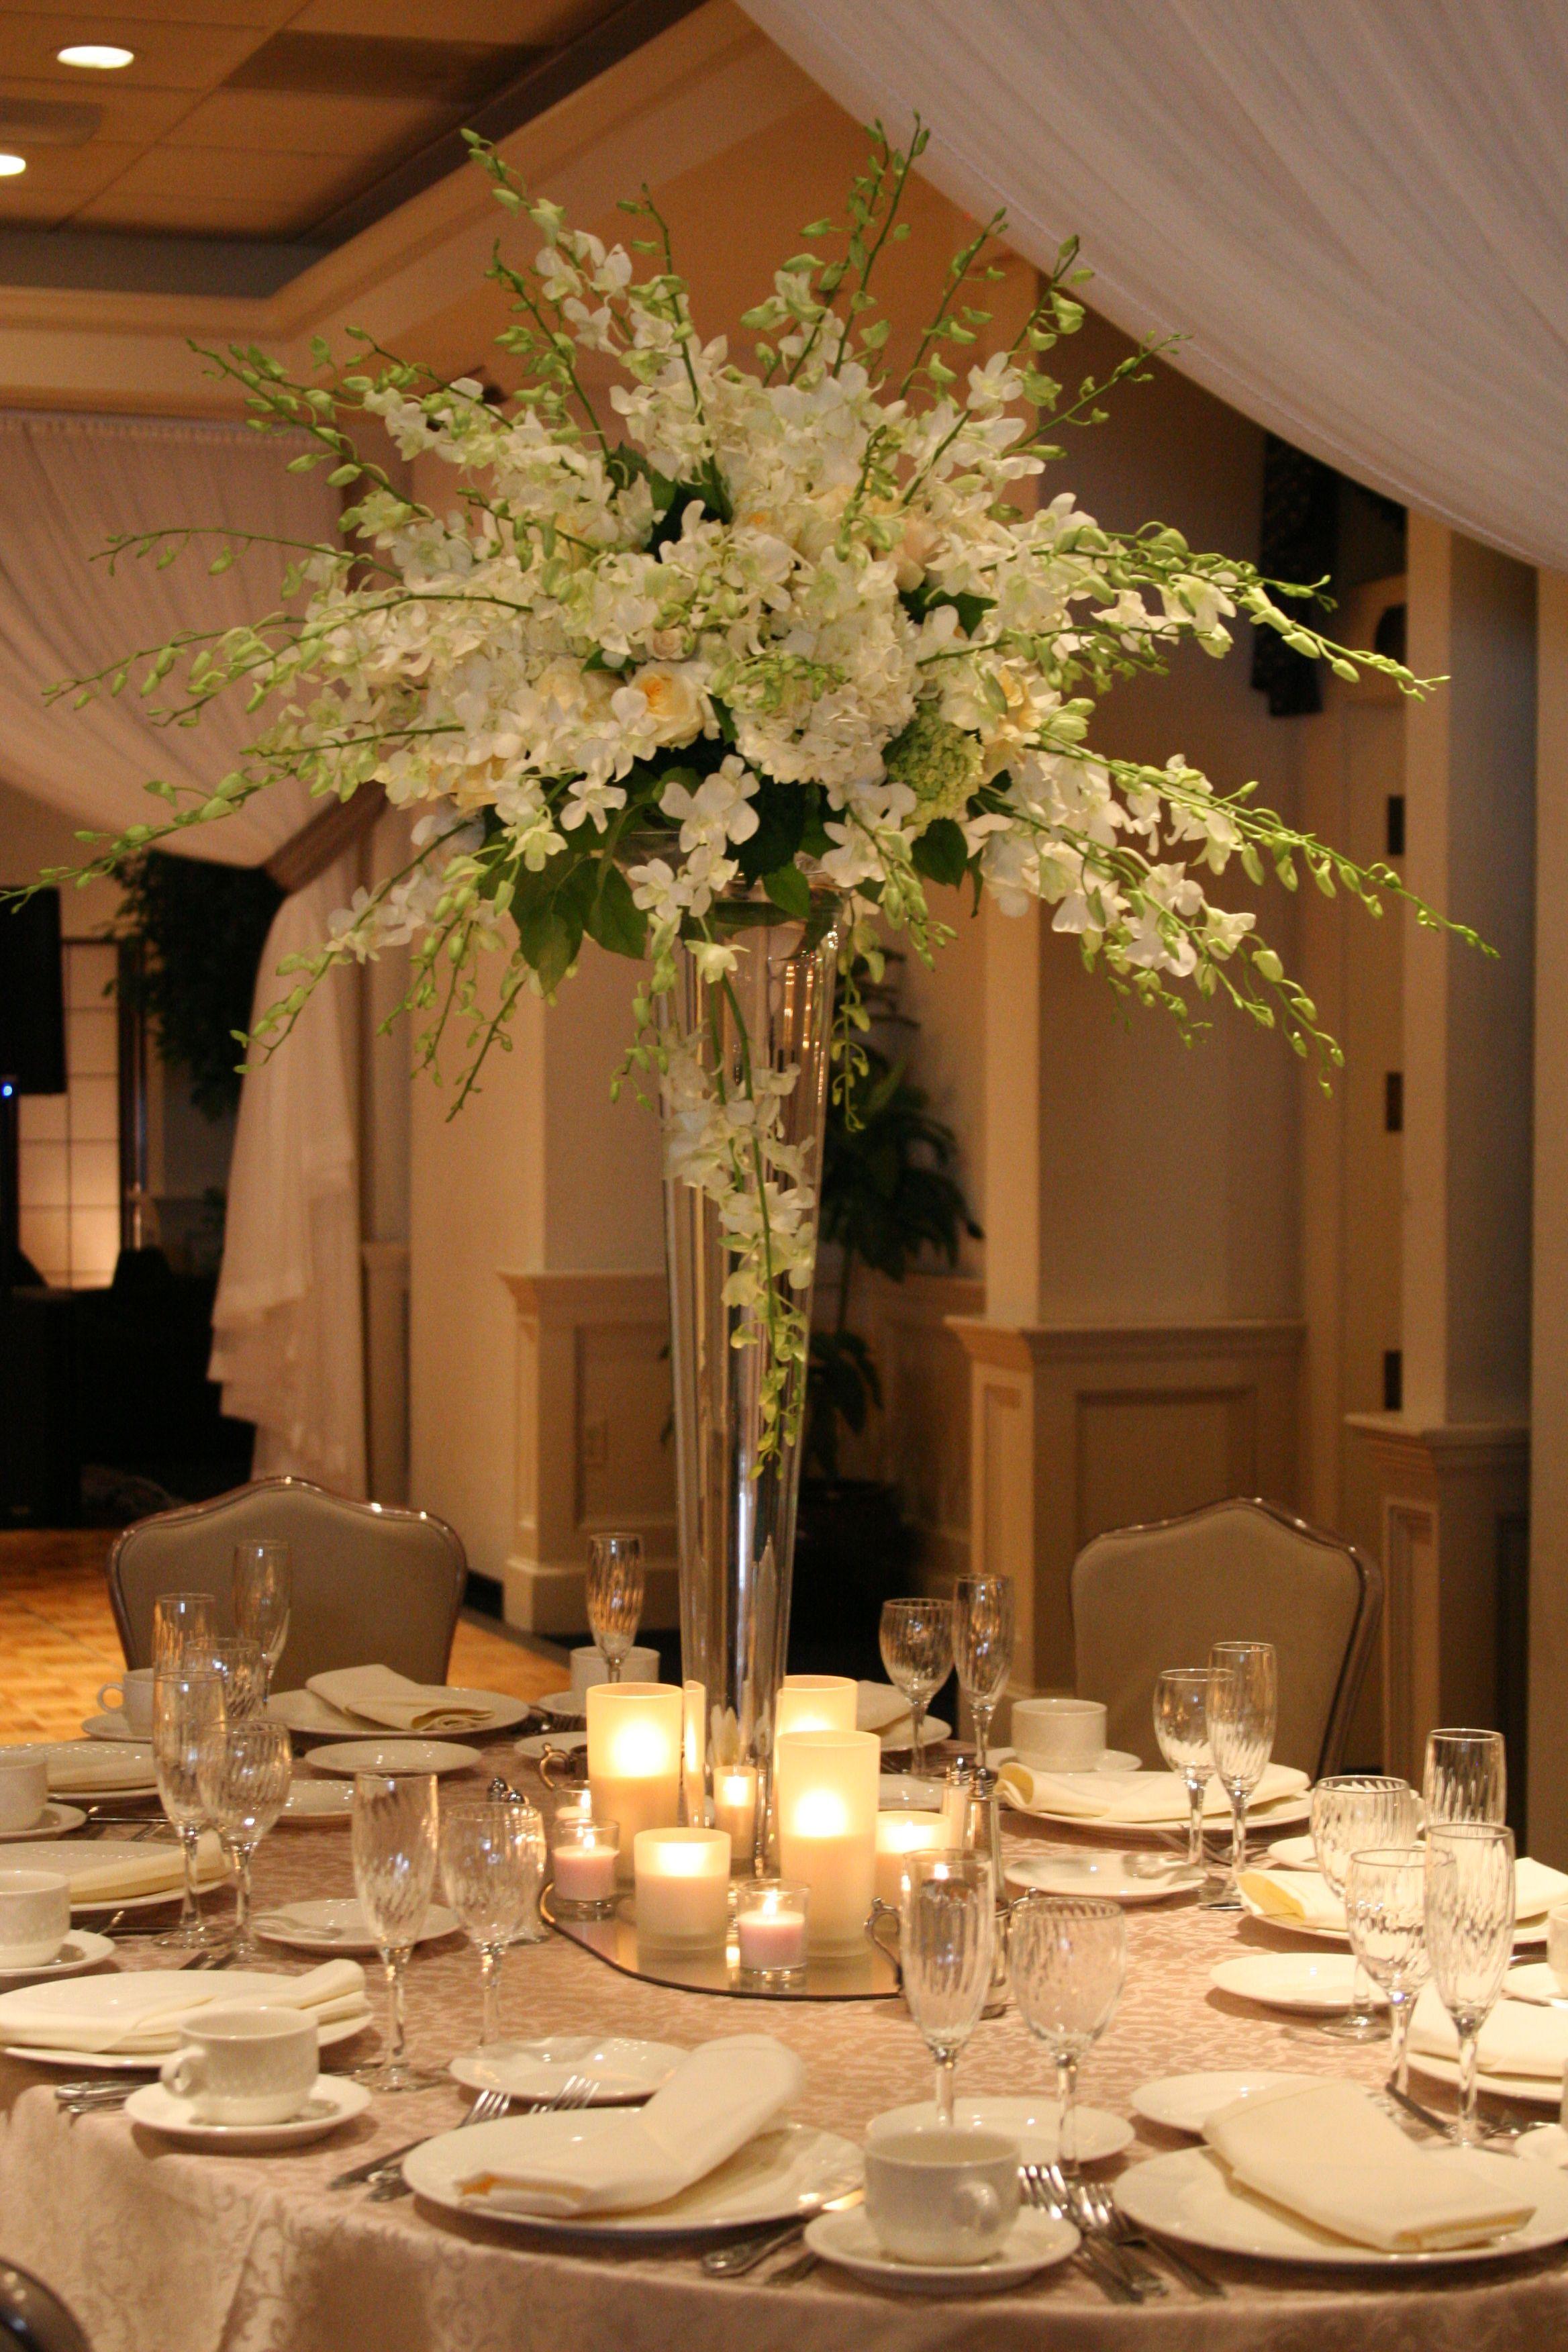 Luxury wedding decoration ideas  white orchid centerpiece  wedding centerpieces  Pinterest  Orchid